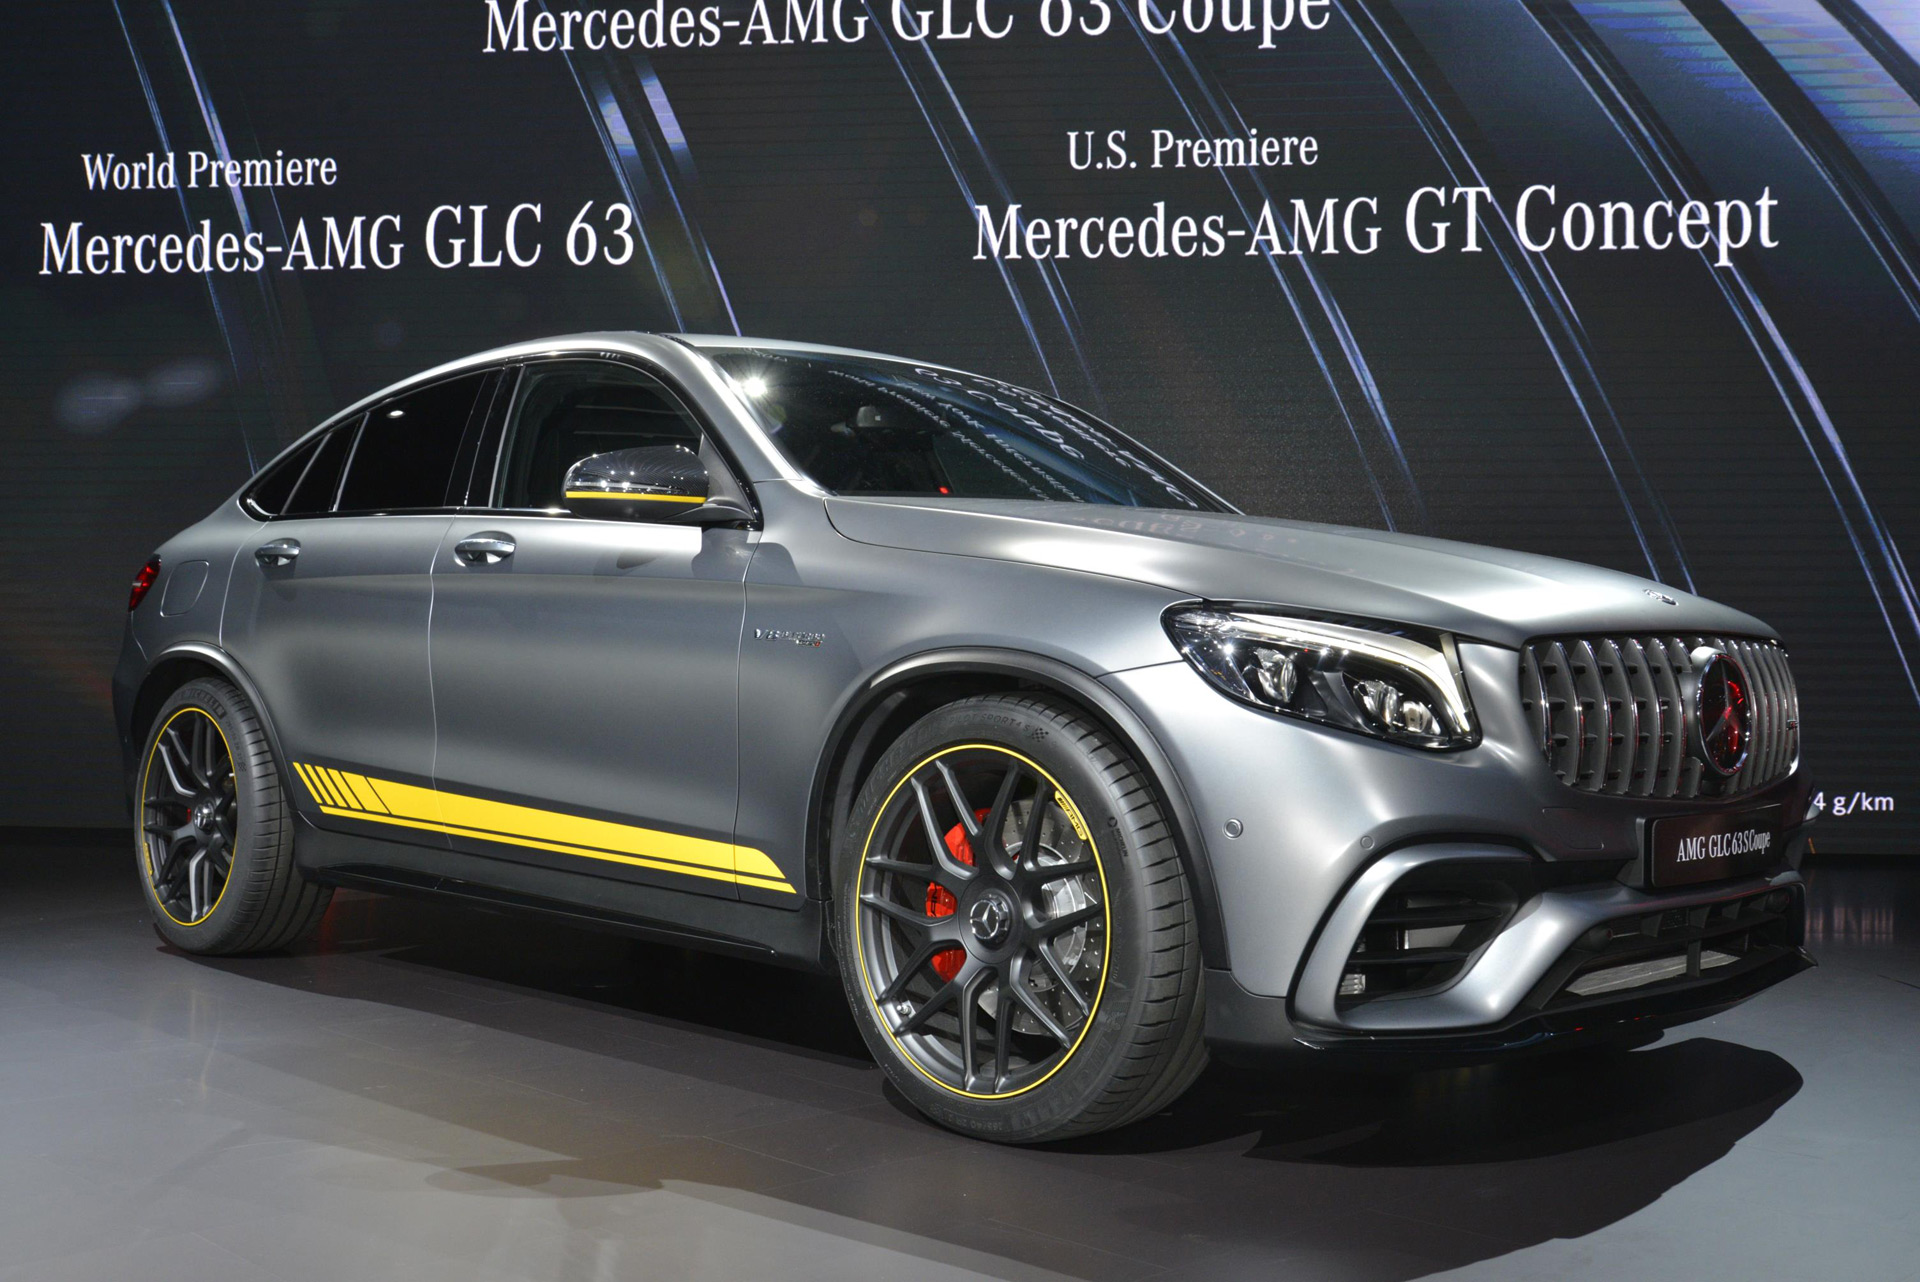 2017-mercedes-amg-glc63-coupe-2017-new-york-auto-show_100599905_h.jpg